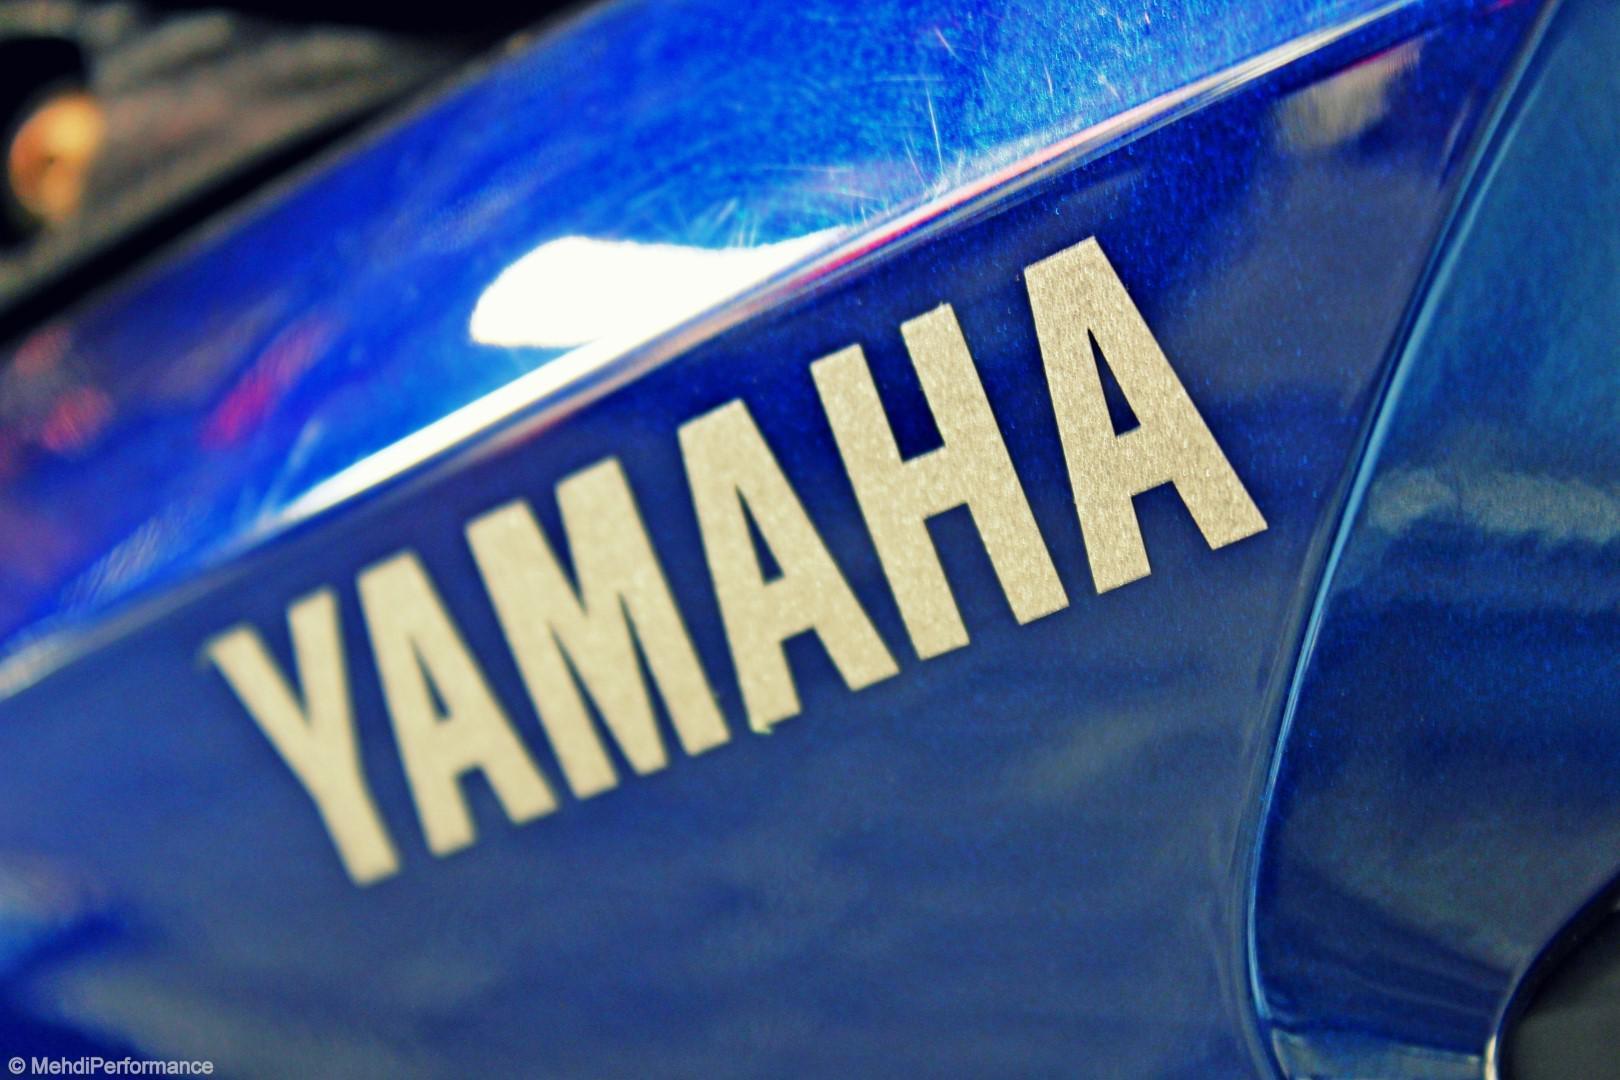 yamaha-ouvre-ses-portes-a-rabat-392-3.jpg